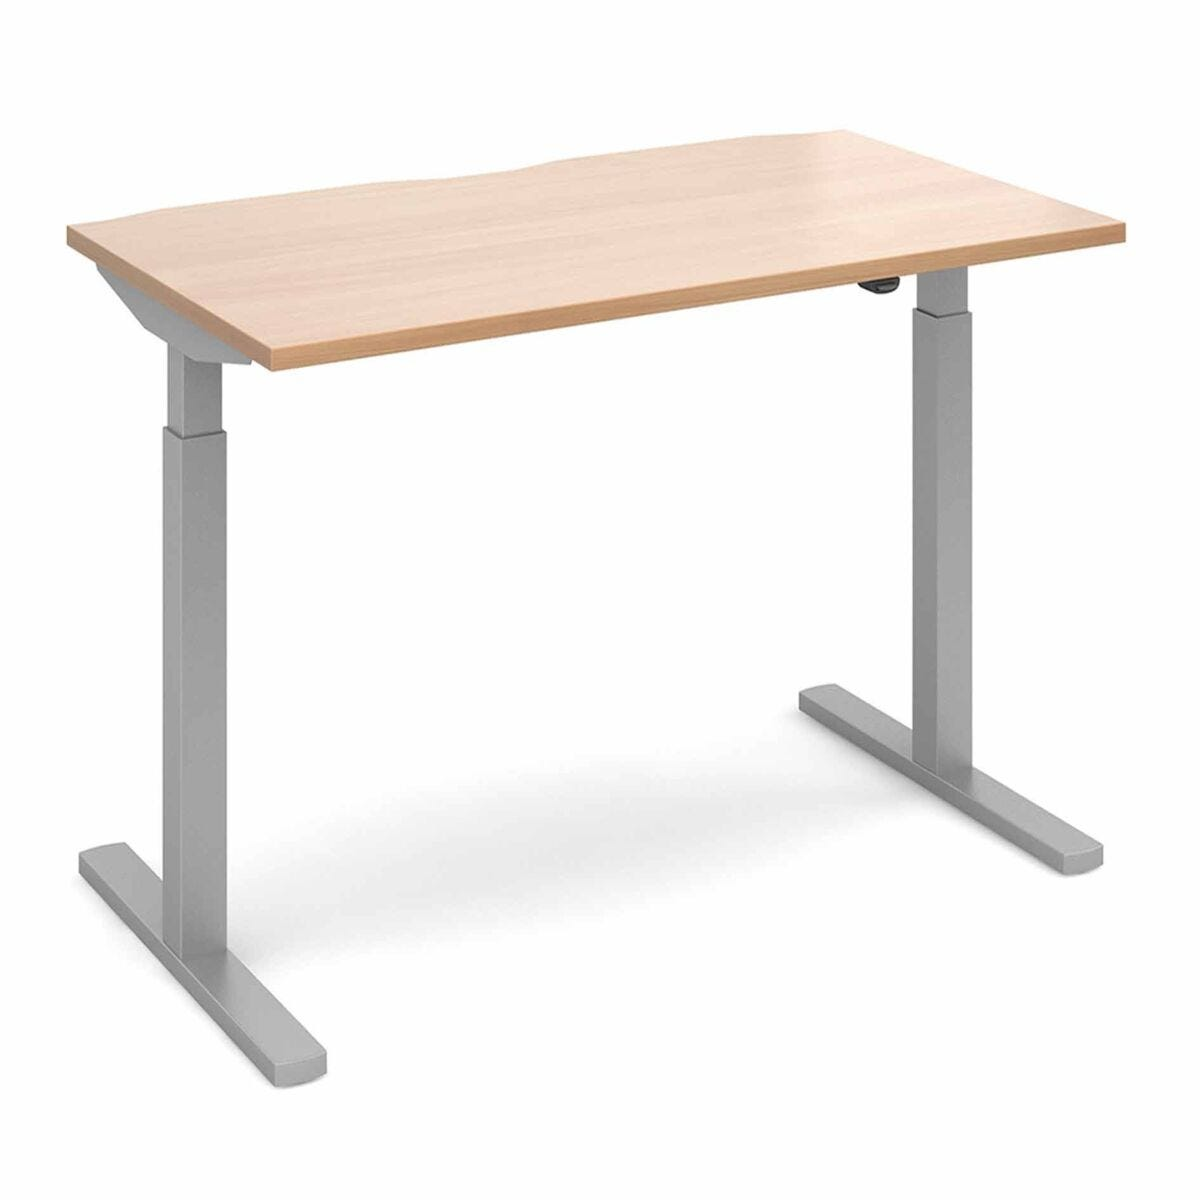 Elev8 Mono Straight Sit Stand Desk 1400mm x 800mm